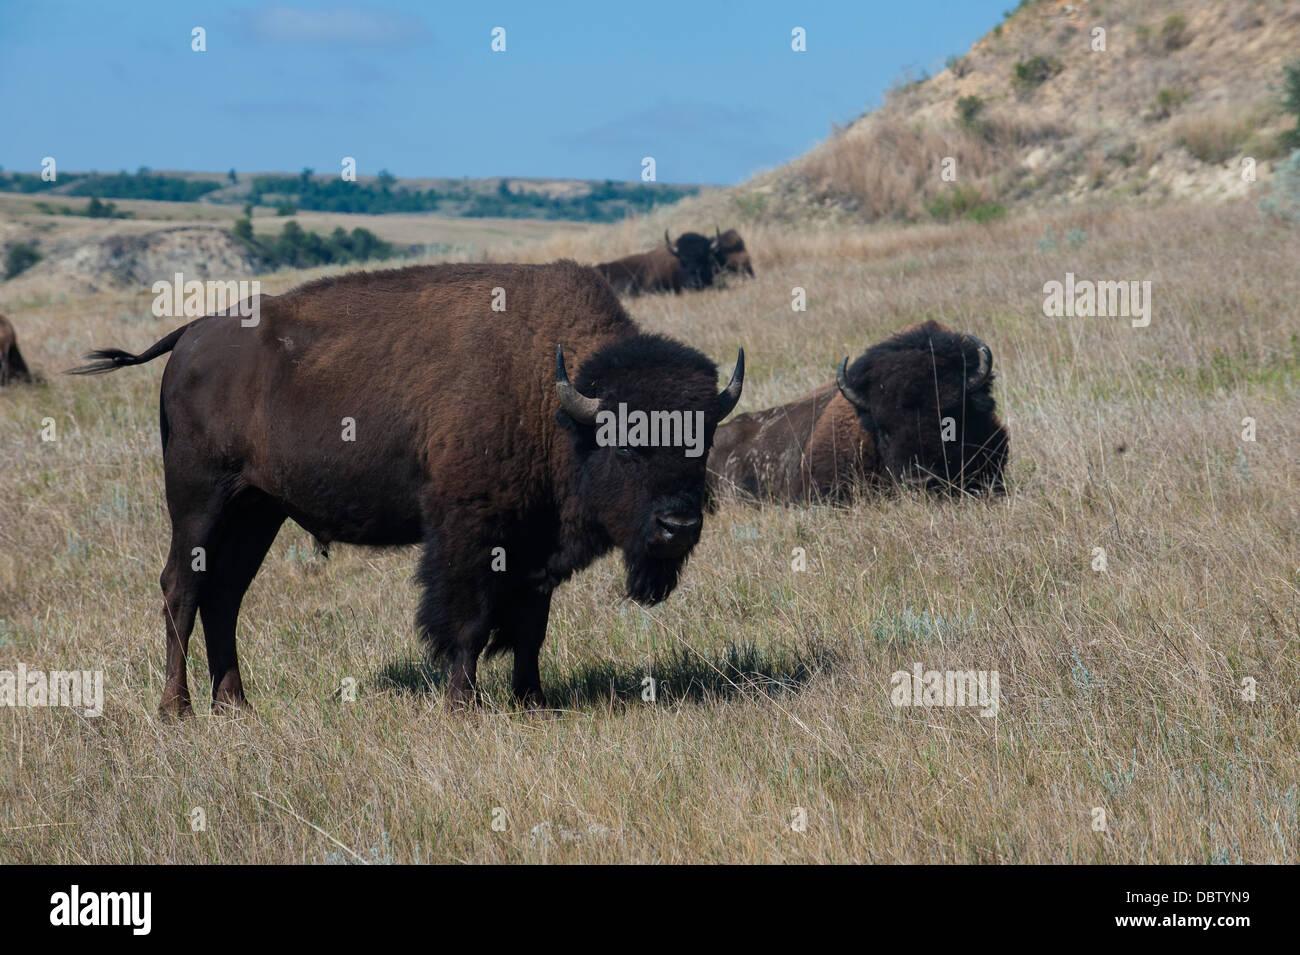 Wild buffalos in the Roosevelt National Park, North Dakota, United States of America, North America - Stock Image